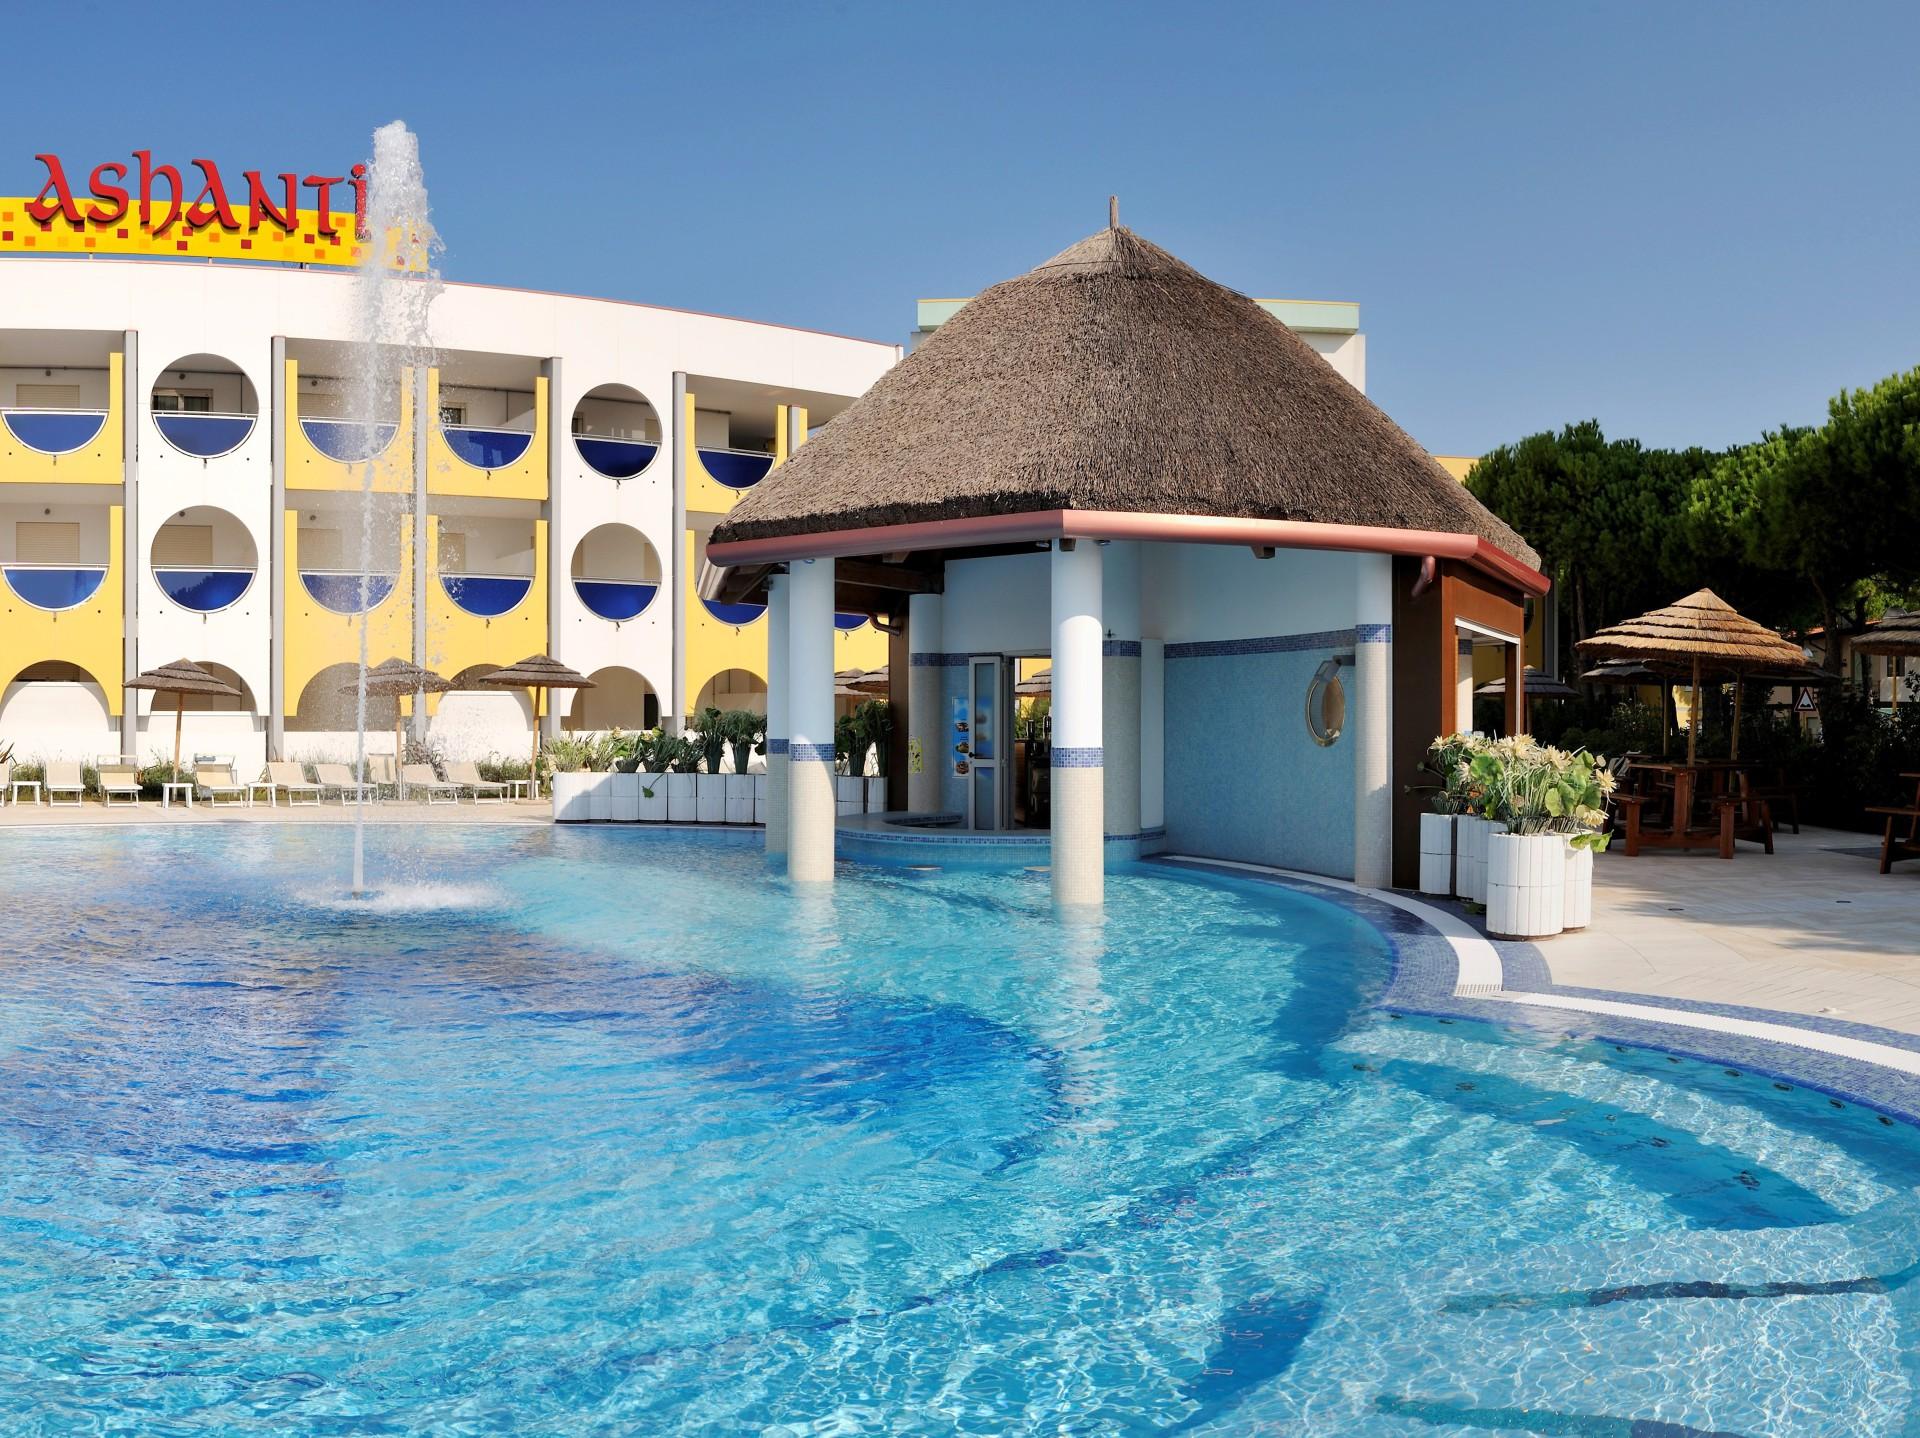 piscina_diurna_pano6-002.jpg